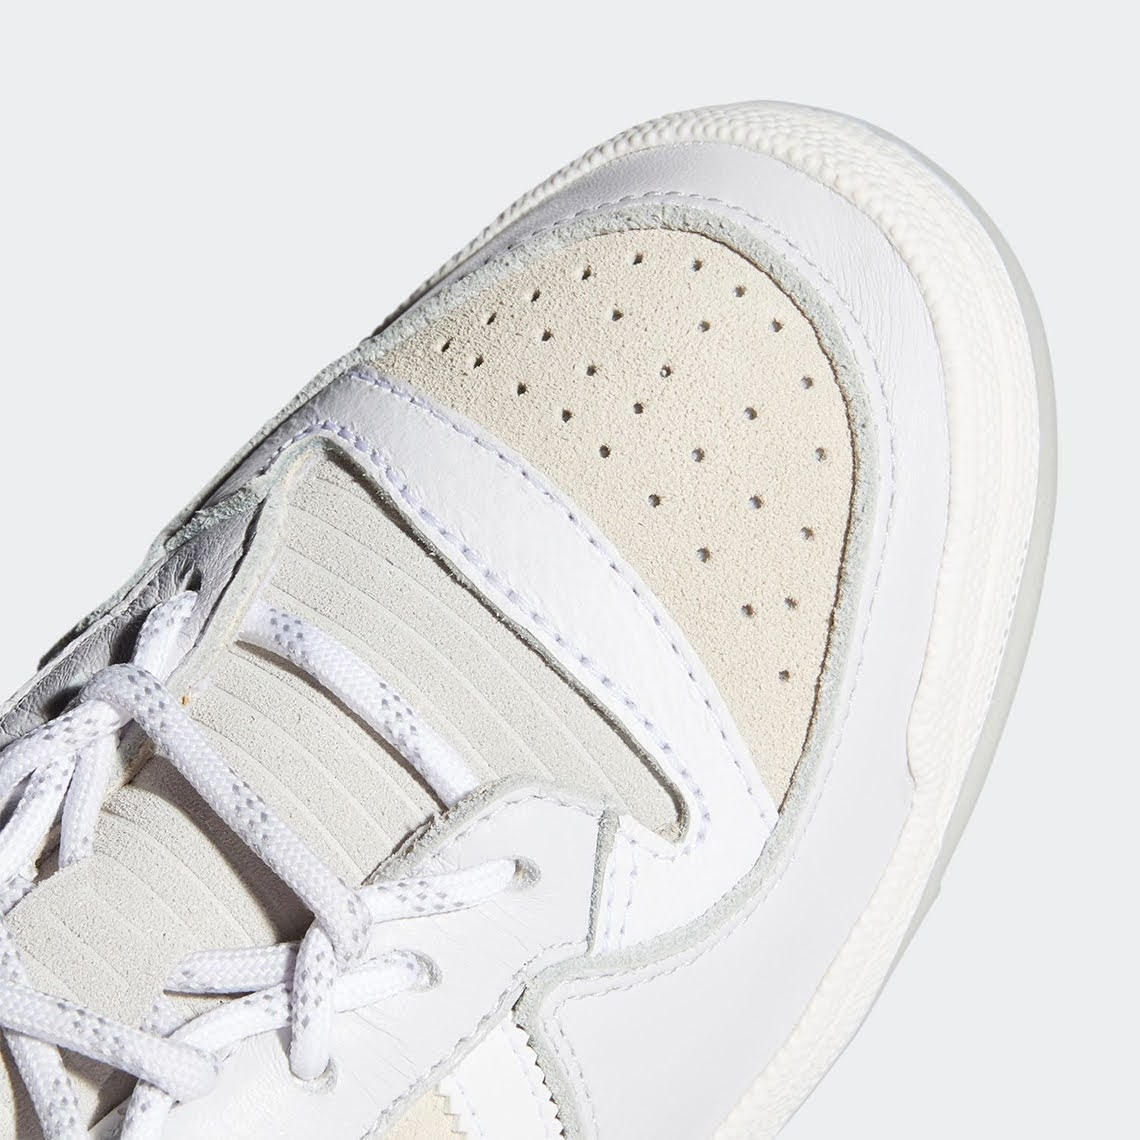 Ivy Park x adidas Forum Low アイビー パーク x アディダス フォルム ロー fz4389 close toe